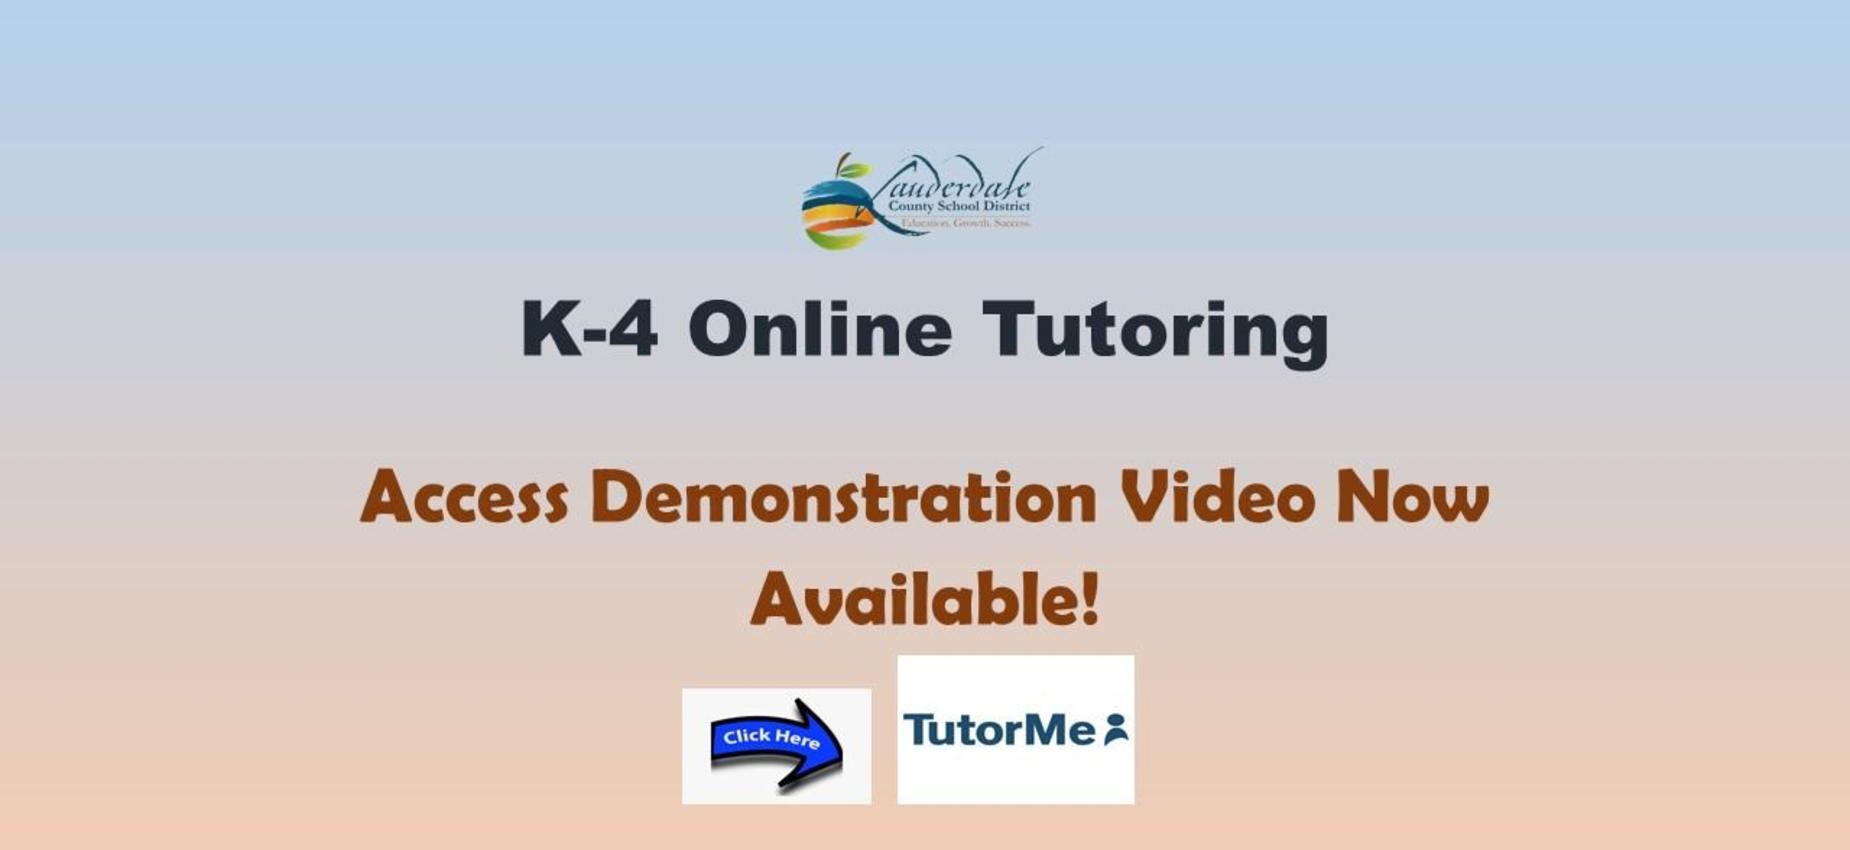 K-4 Online Tutoring Graphic